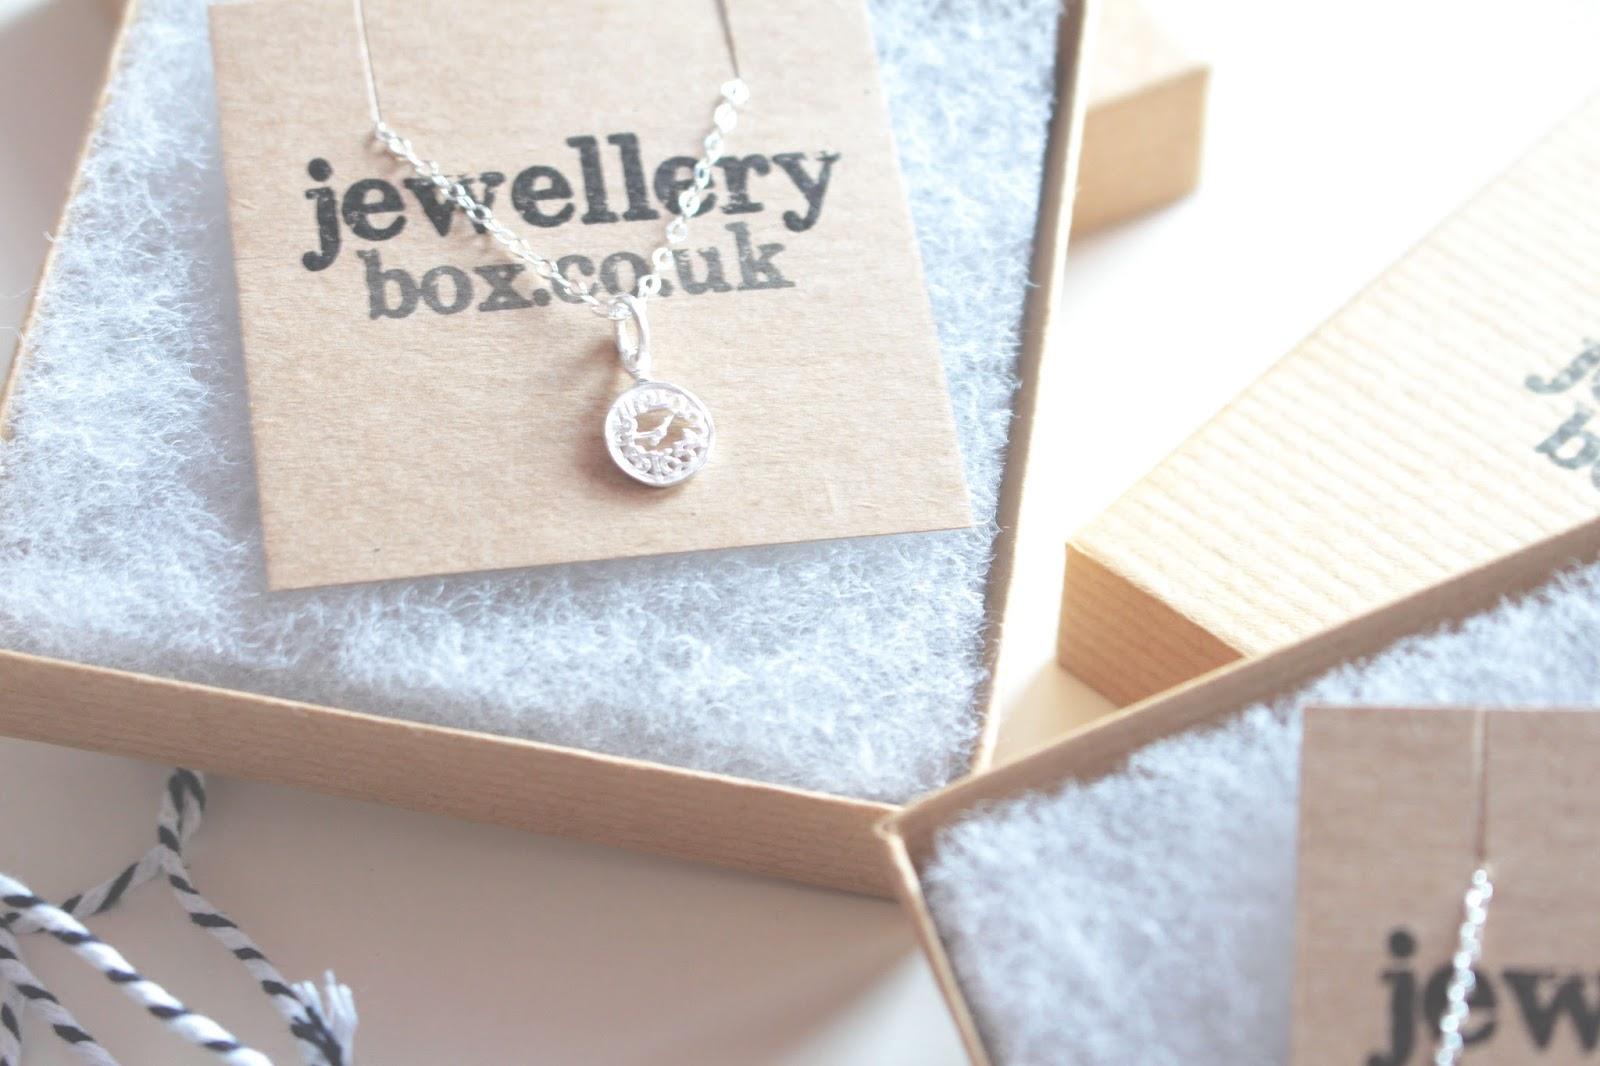 Alice in wonderland necklace jewellerybox.co.uk